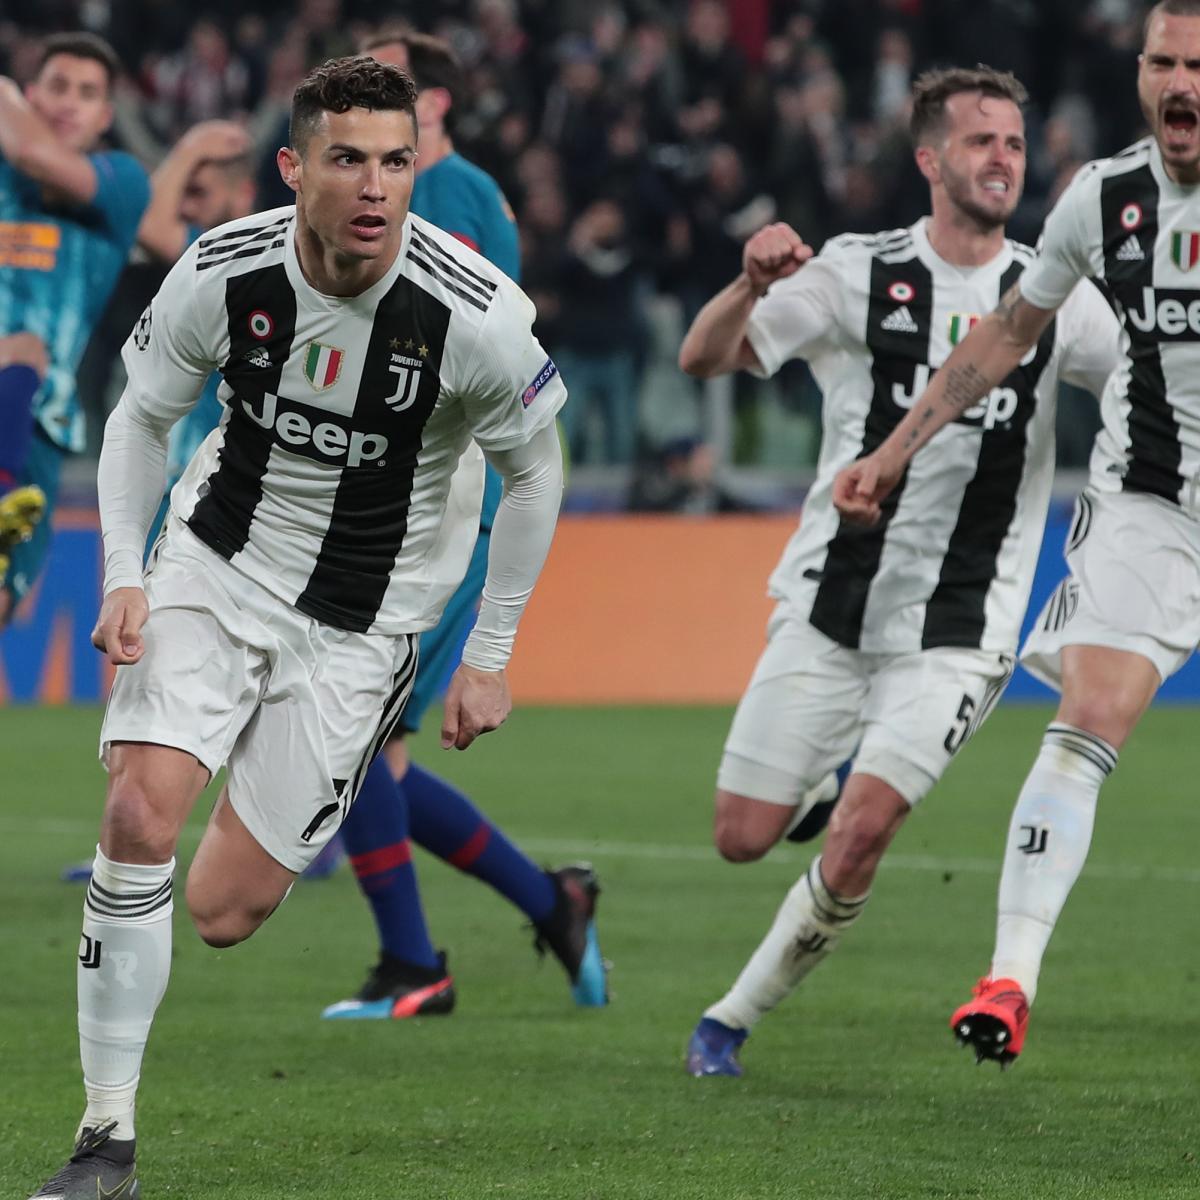 Cristiano Ronaldo S 4 Goals Lead Real Madrid To Win Vs: Cristiano Ronaldo's Hat Trick Lead Juventus To Win Vs